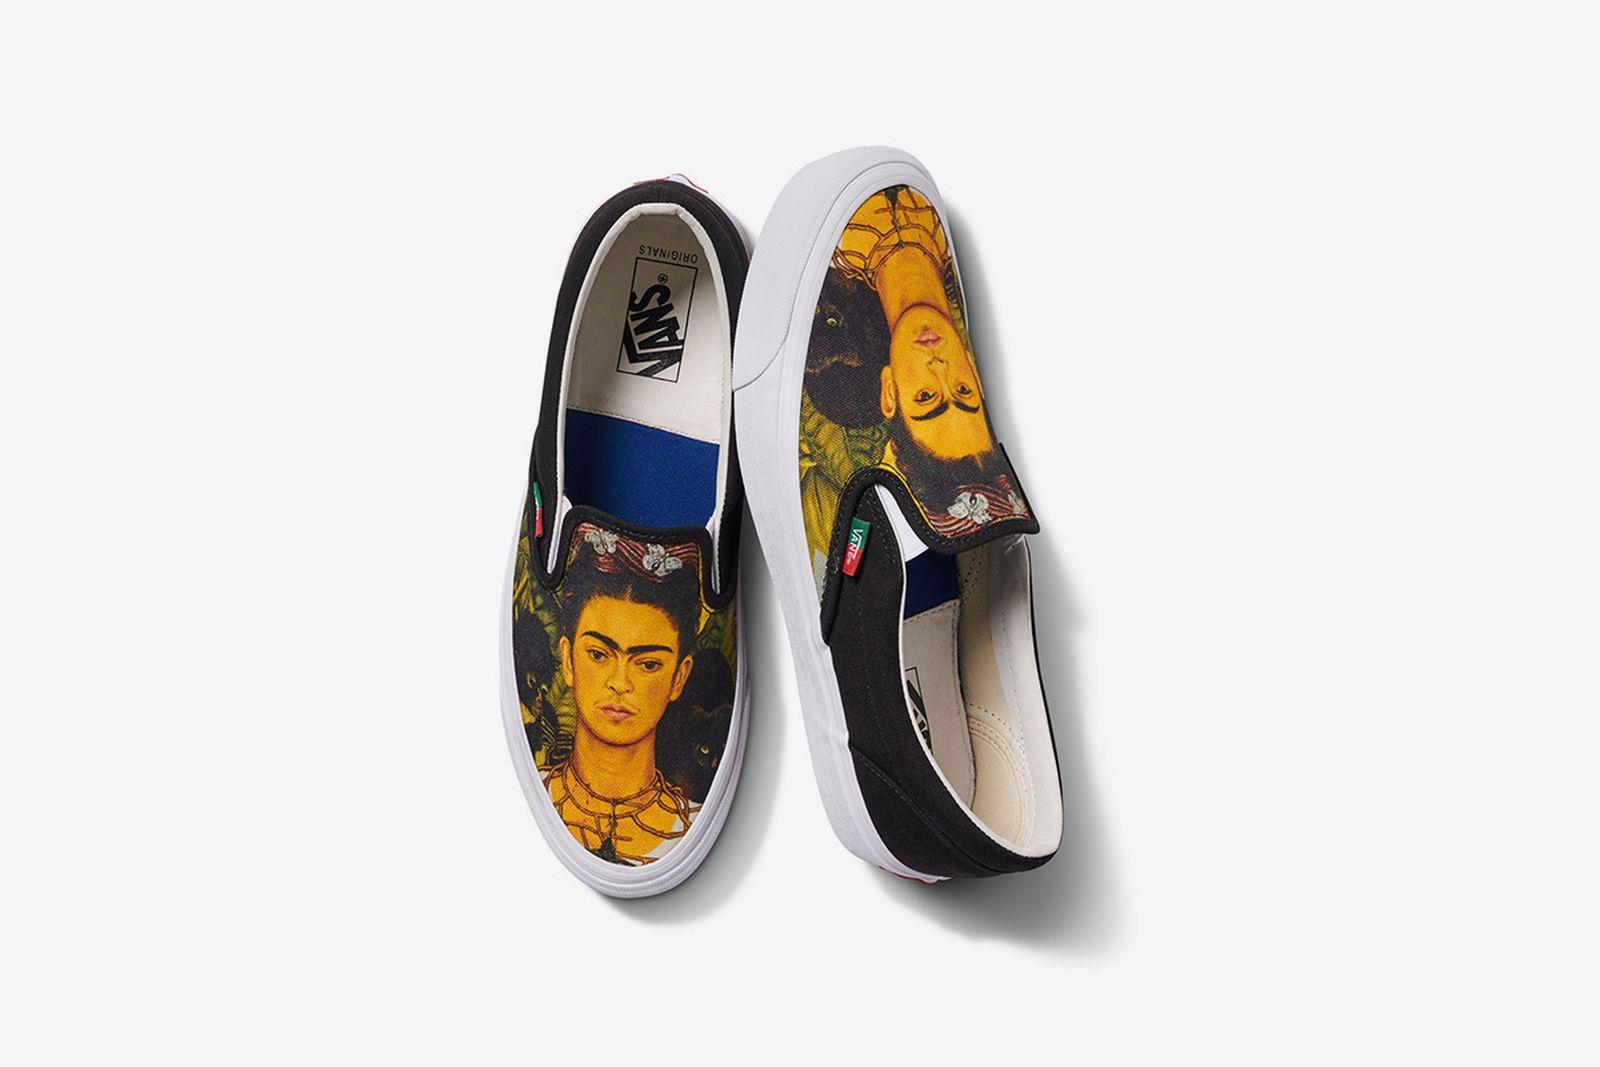 vans frida kahlo collection release date price vault by vans